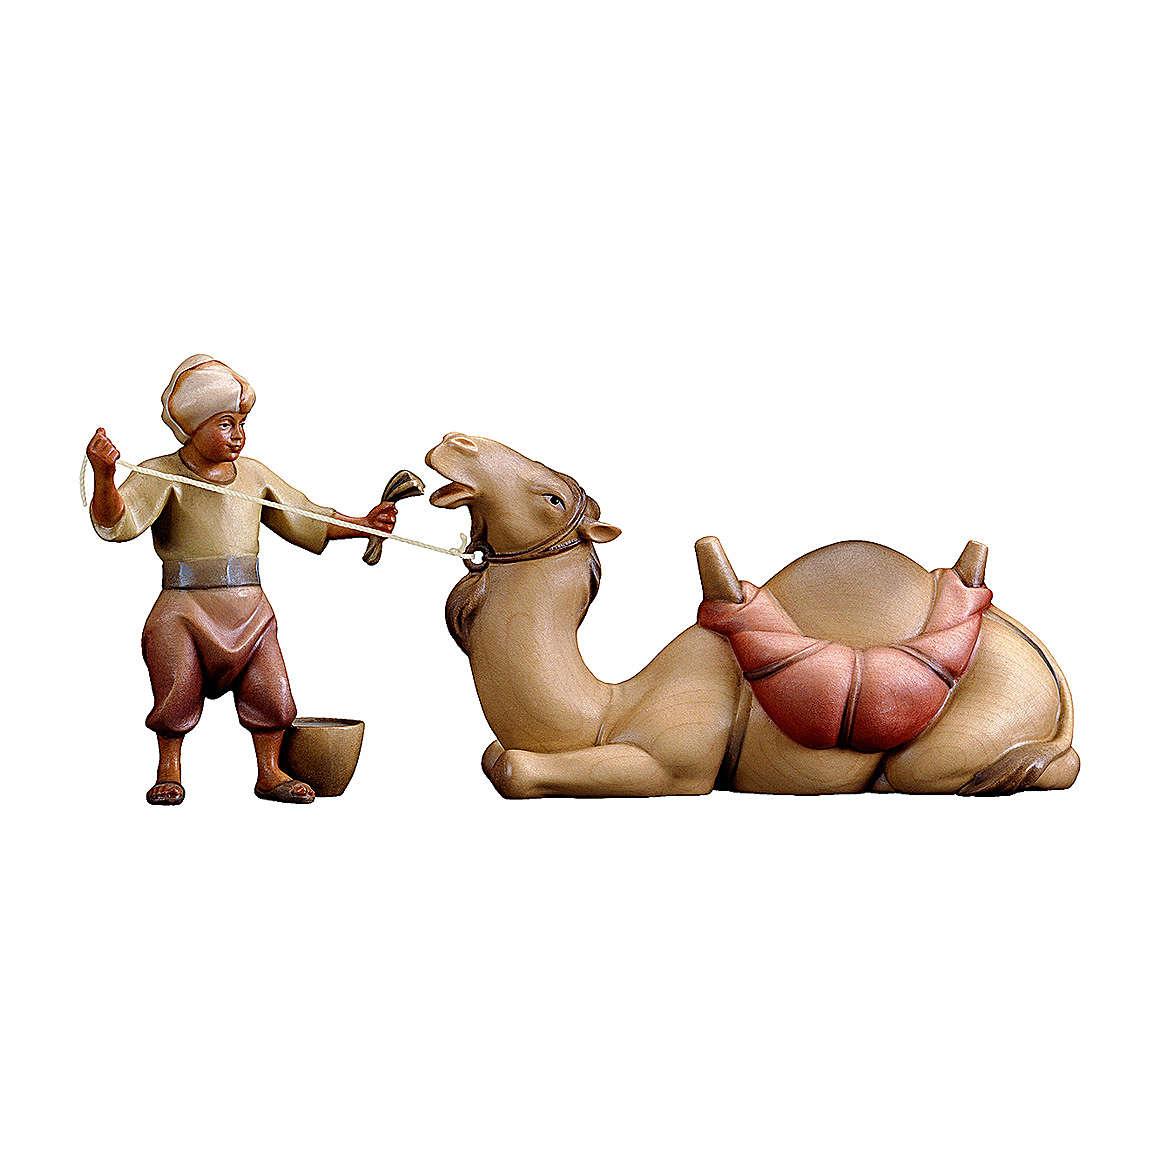 Giovane cammelliere con cammello sdraiato presepe Original Redentore legno Val Gardena 10 cm 4